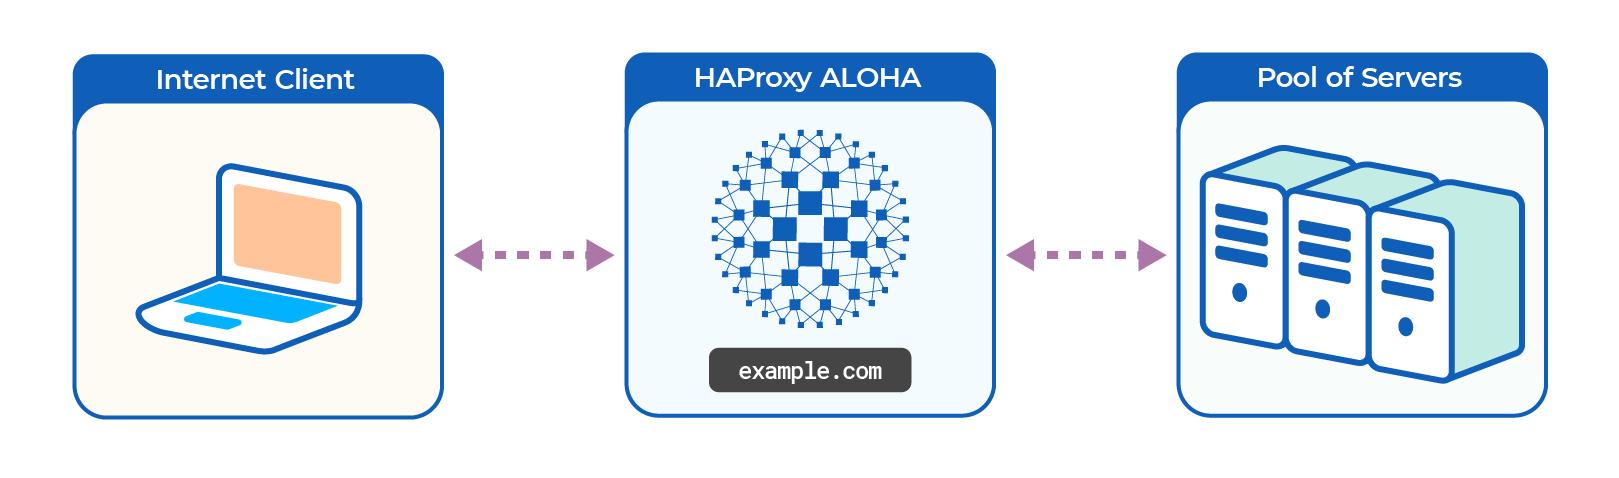 https://cdn.haproxy.com/documentation/aloha/latest/assets/aloha-overview-c737b3e0e2fe4b264d6fa7af6d63614fb1d945db5bf5804bfabcadfc4c085da8.png